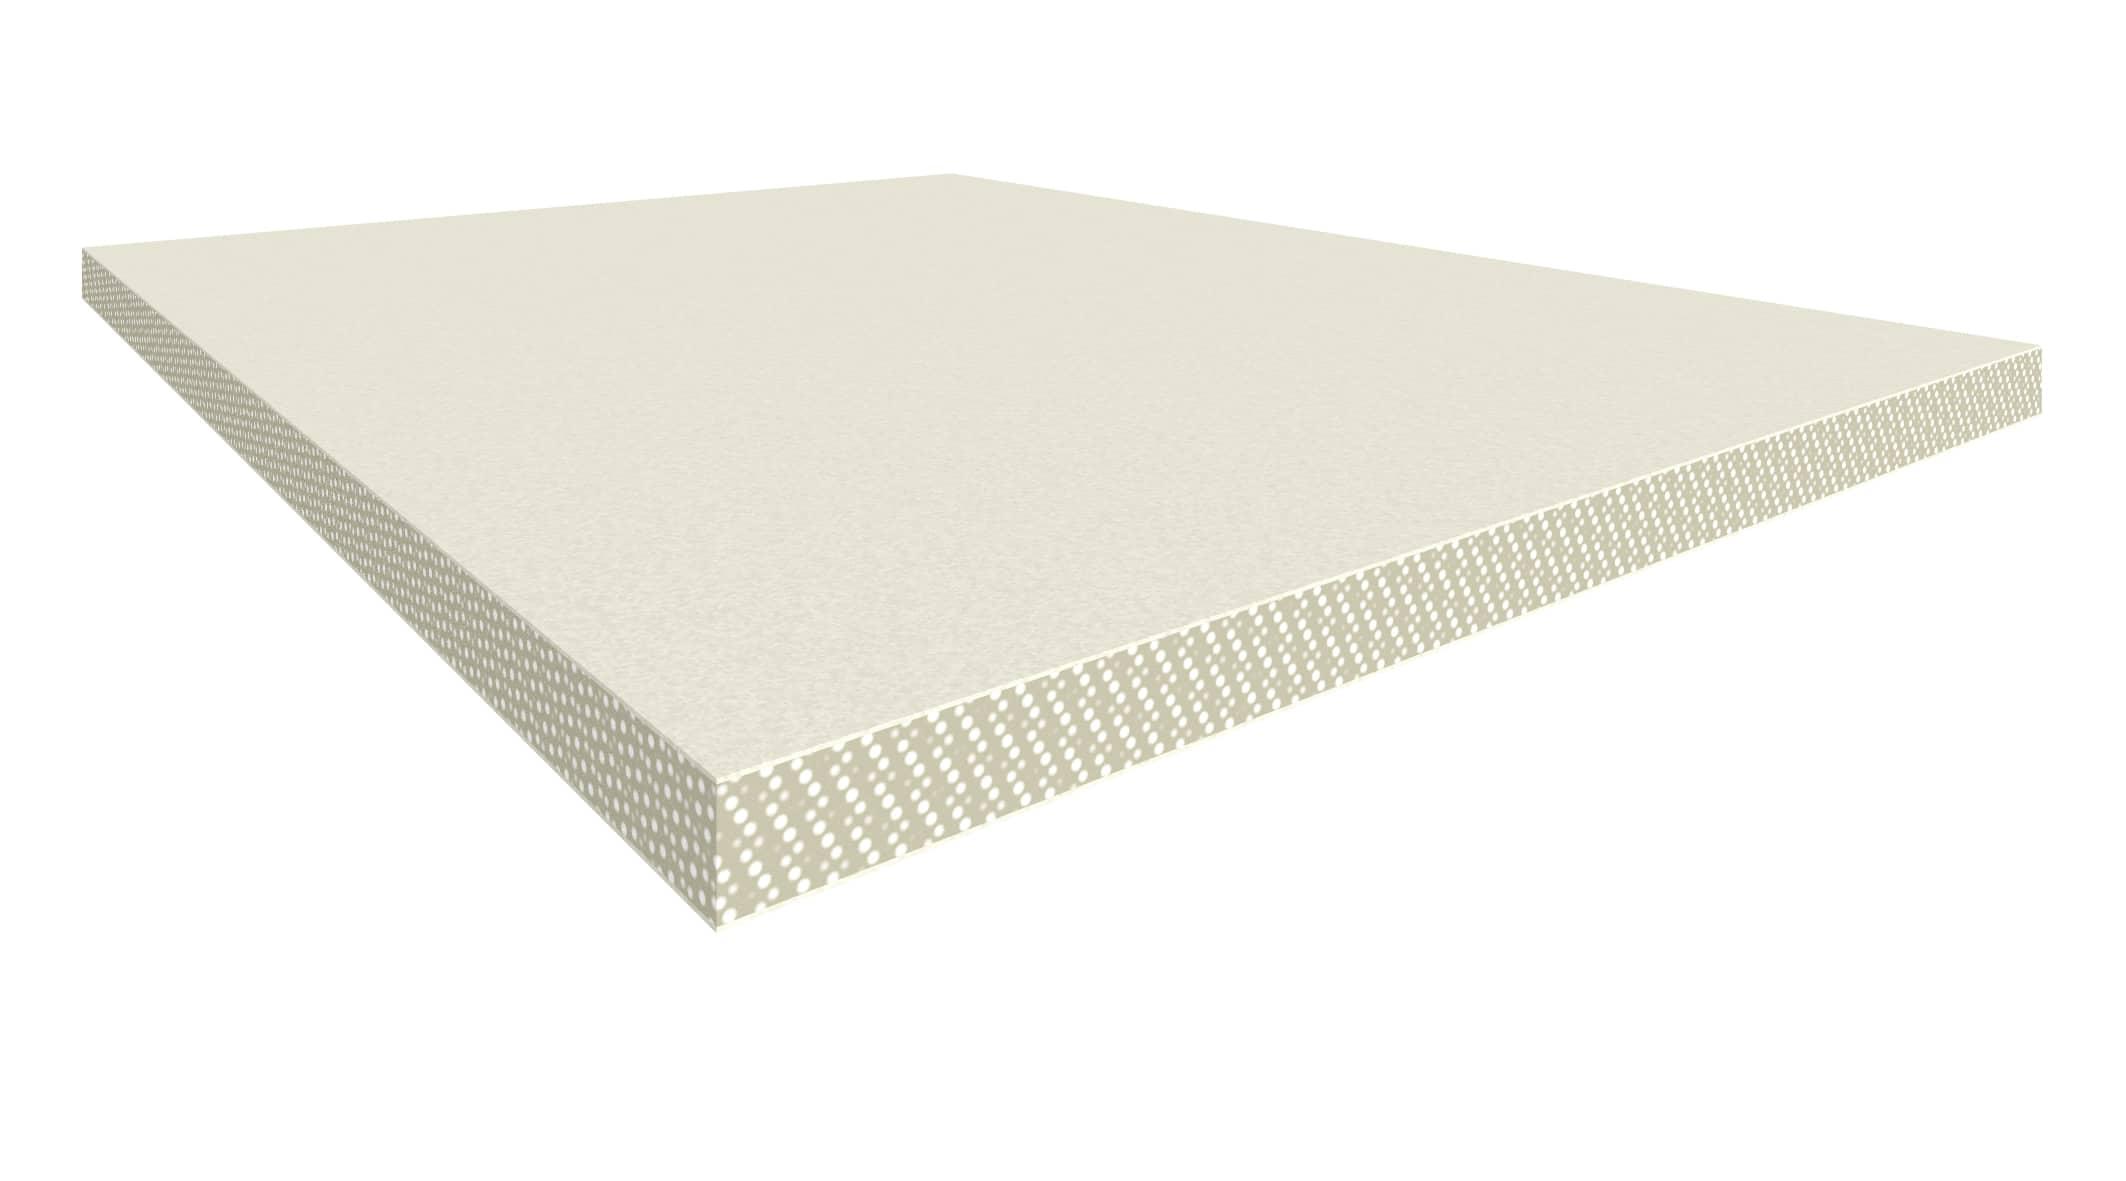 Lastra di cartongesso externa light alta resistenza ignifuga x